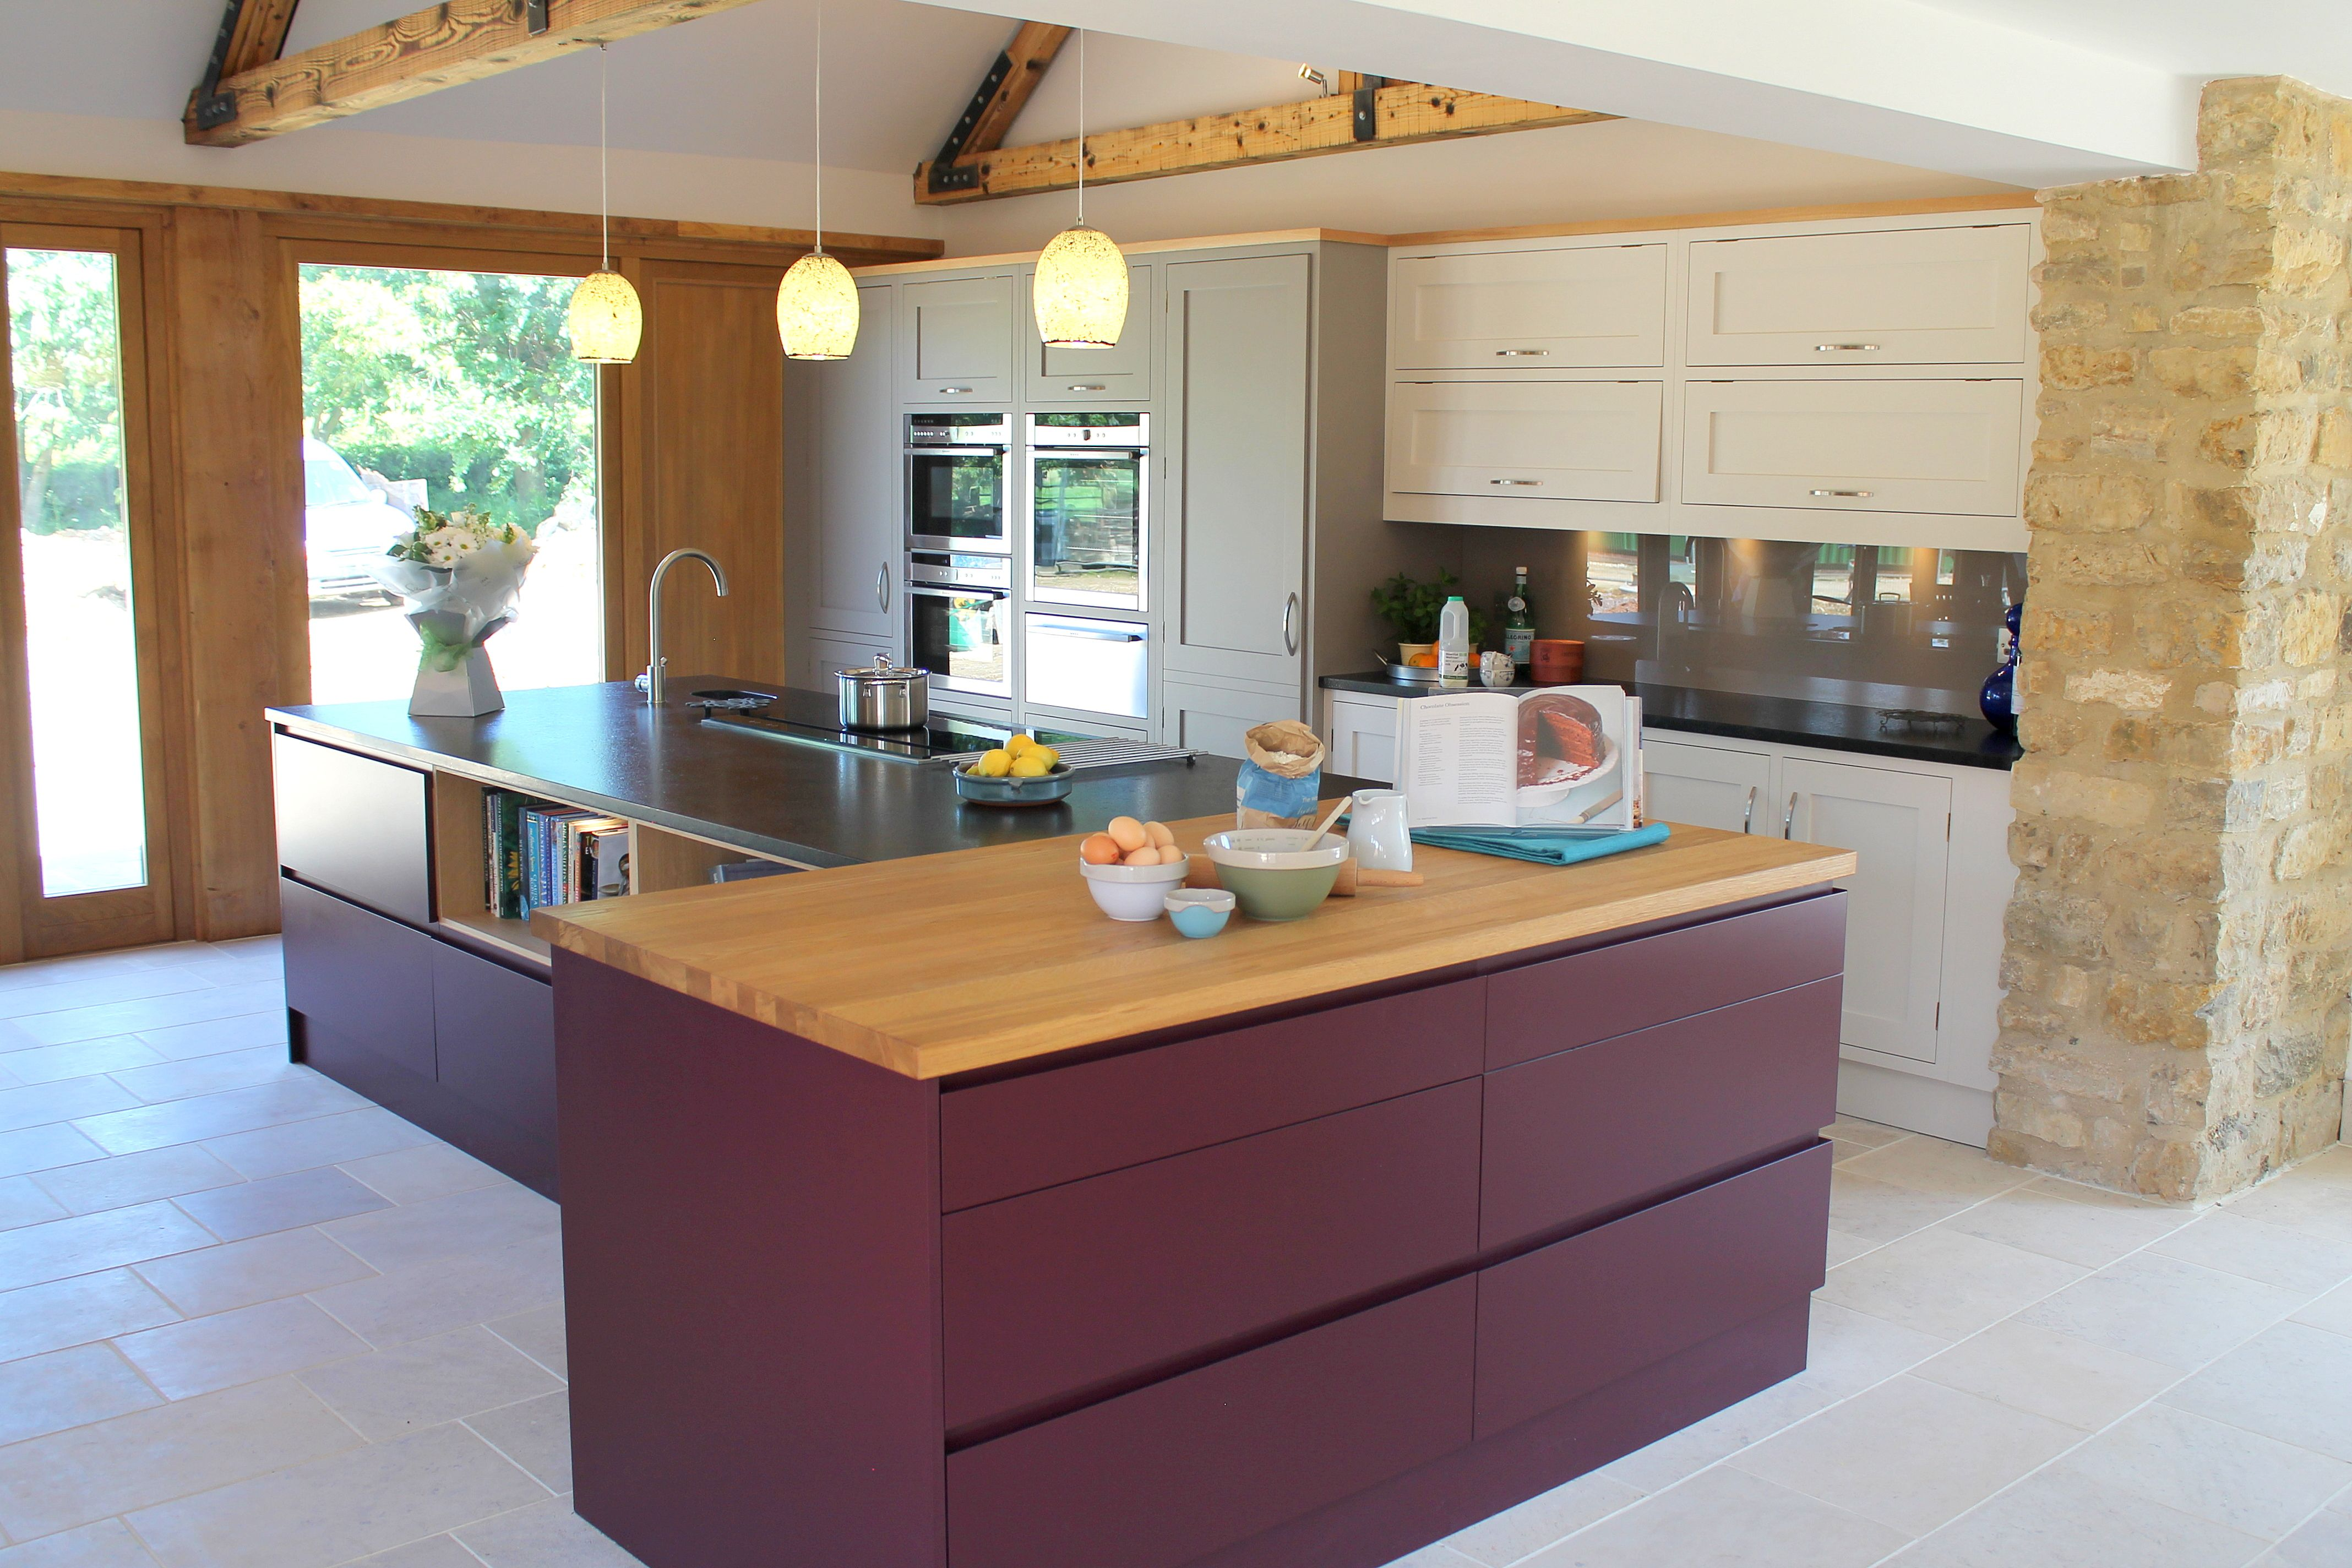 English bespoke handmade kitchens by Krantz Designs. www